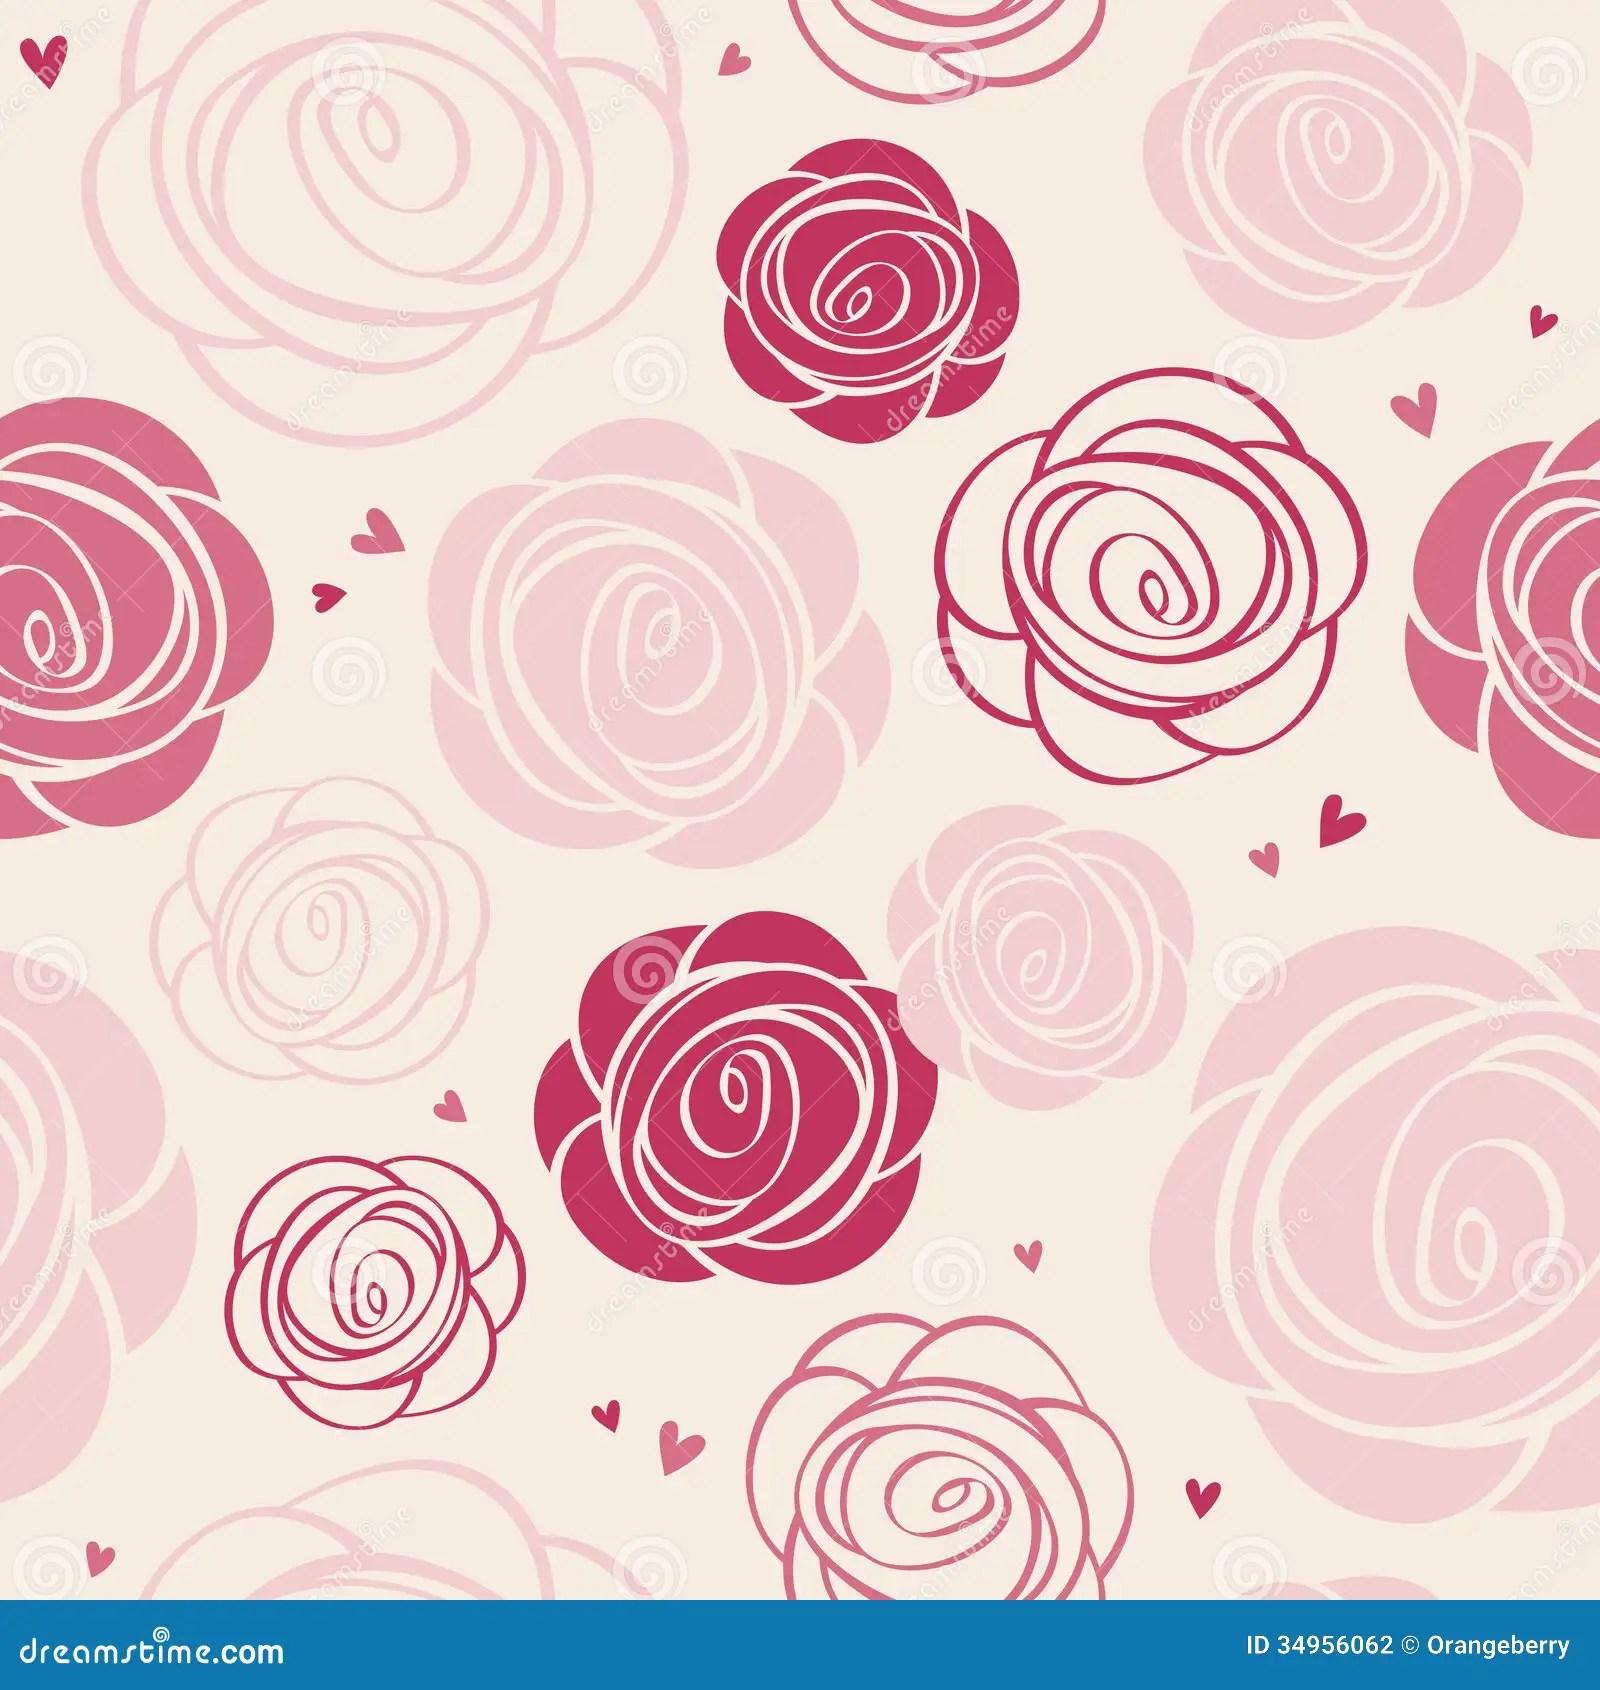 Single Rose Wallpaper Hd Seamless Roses Pattern Stock Vector Illustration Of Card